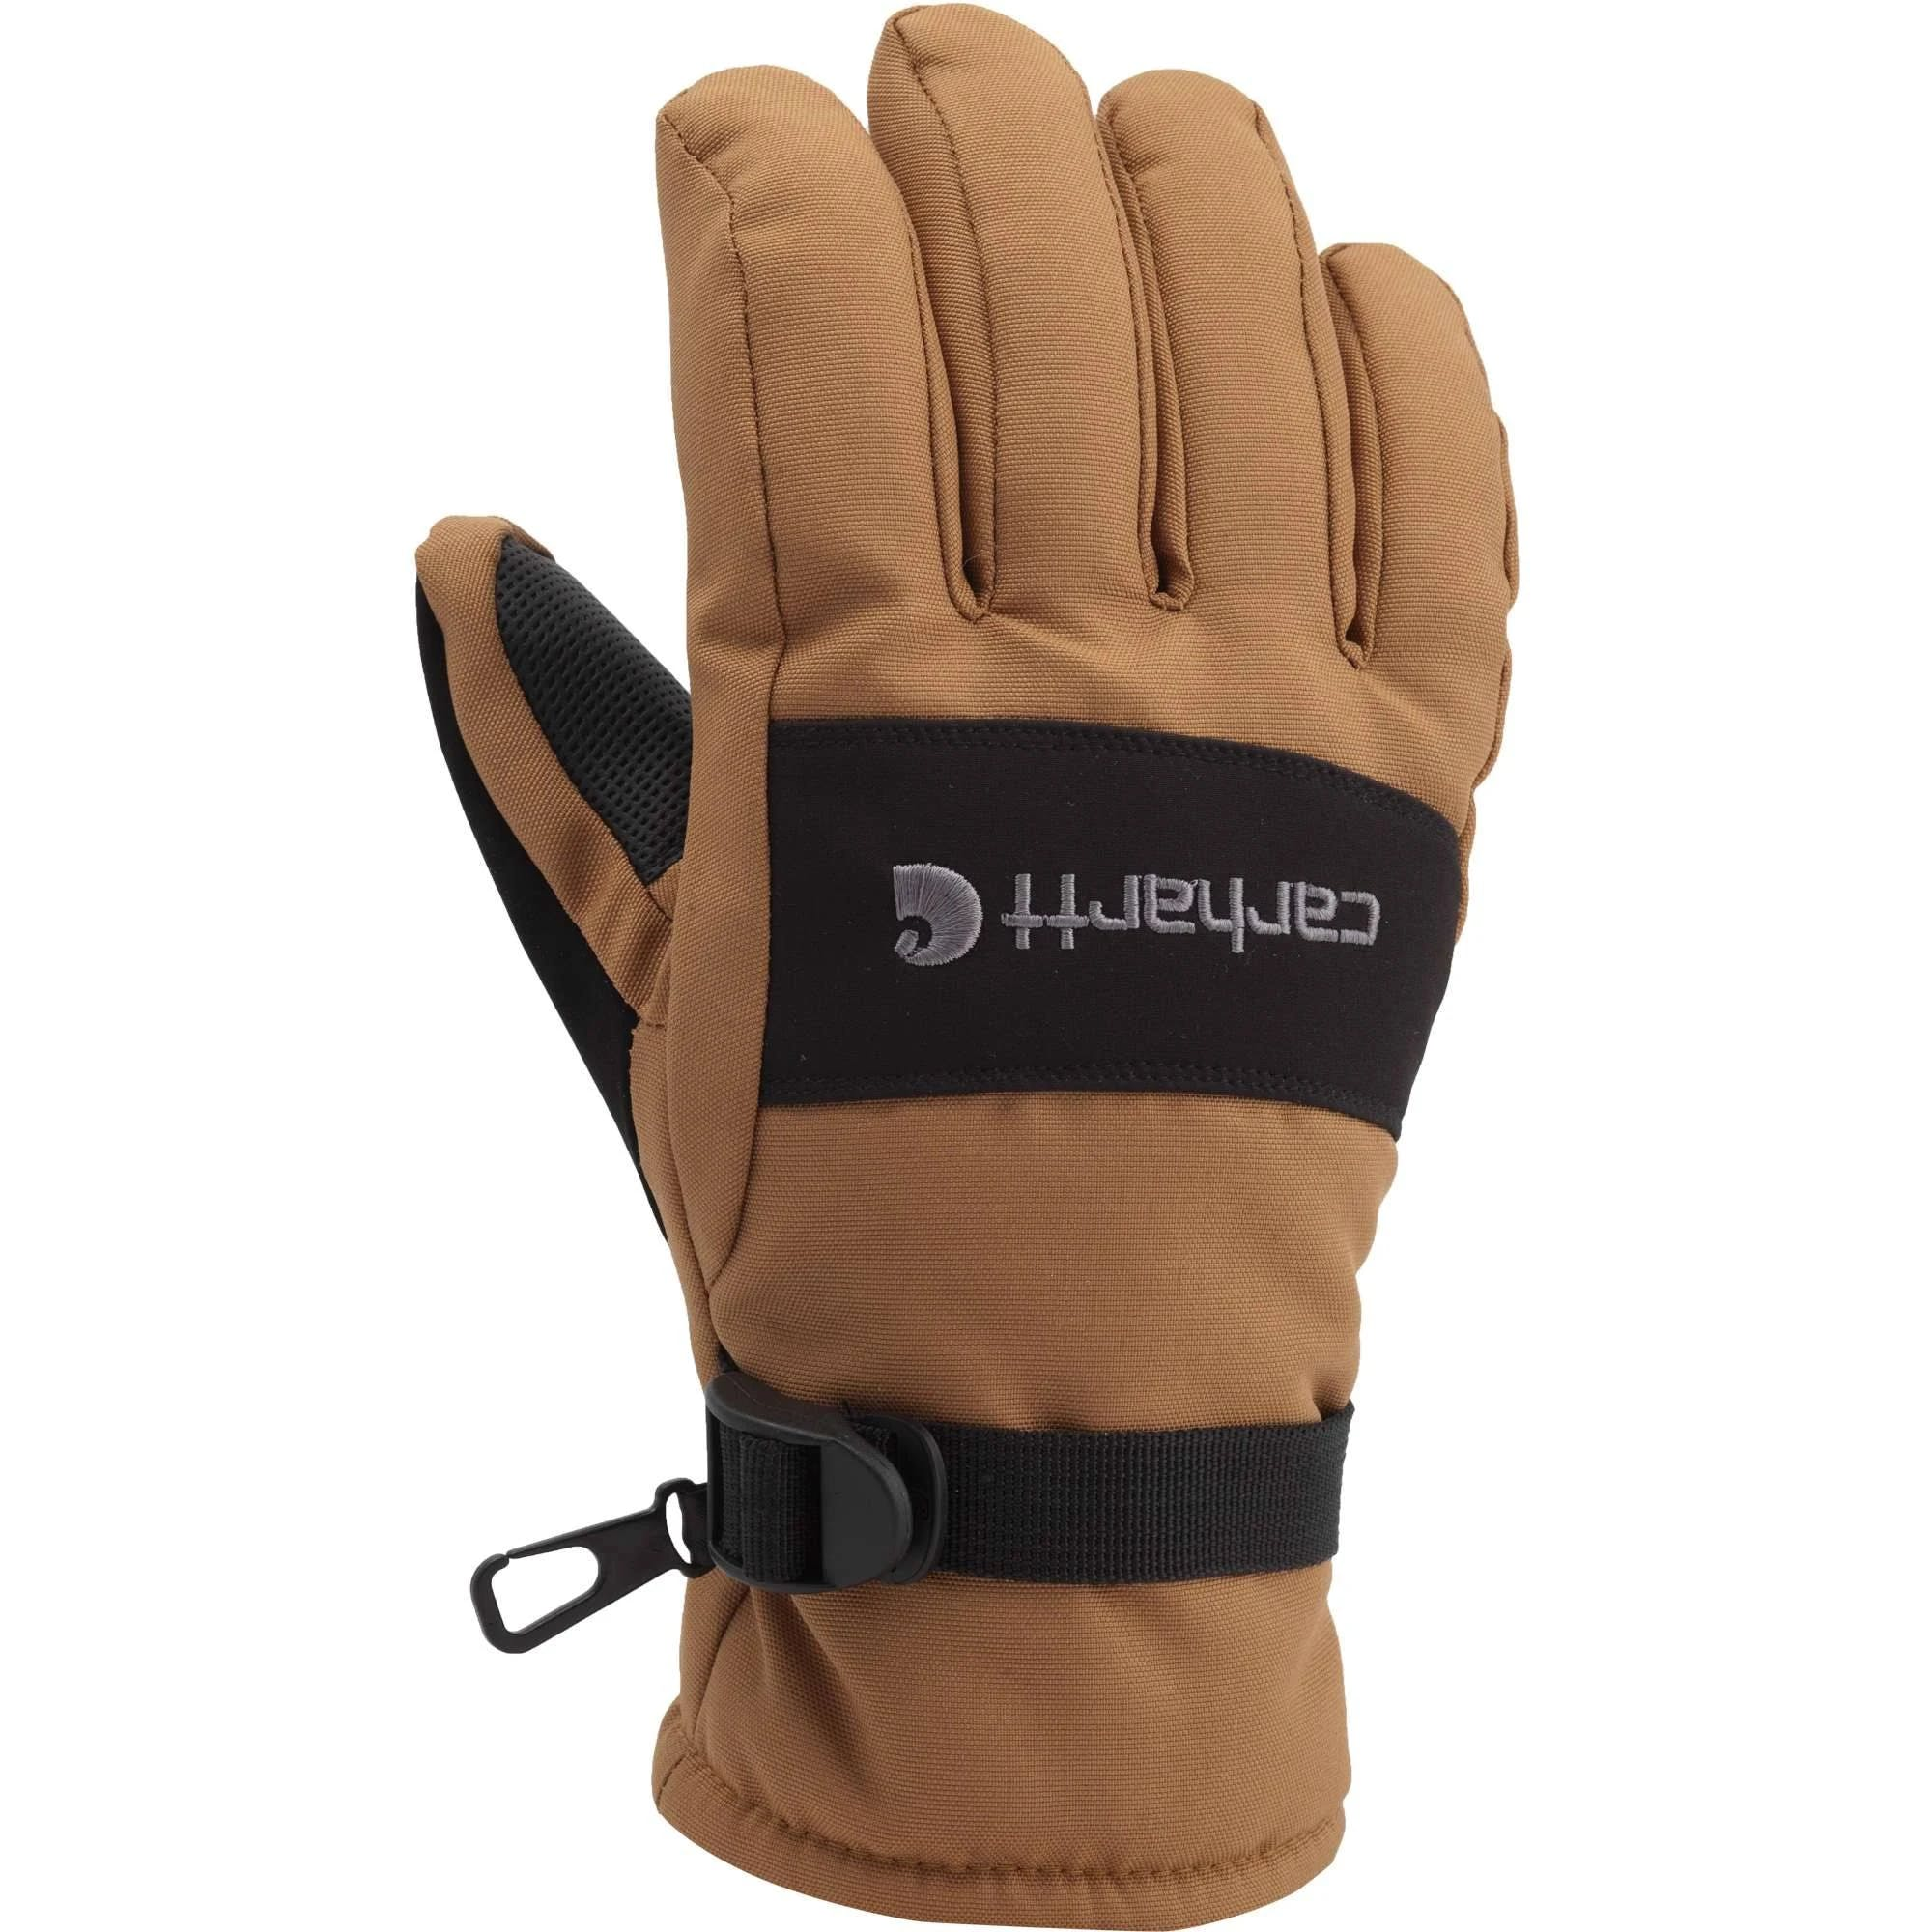 Carhartt Carhartt Men's Wp Waterproof Insulated Glove Brown/black Small